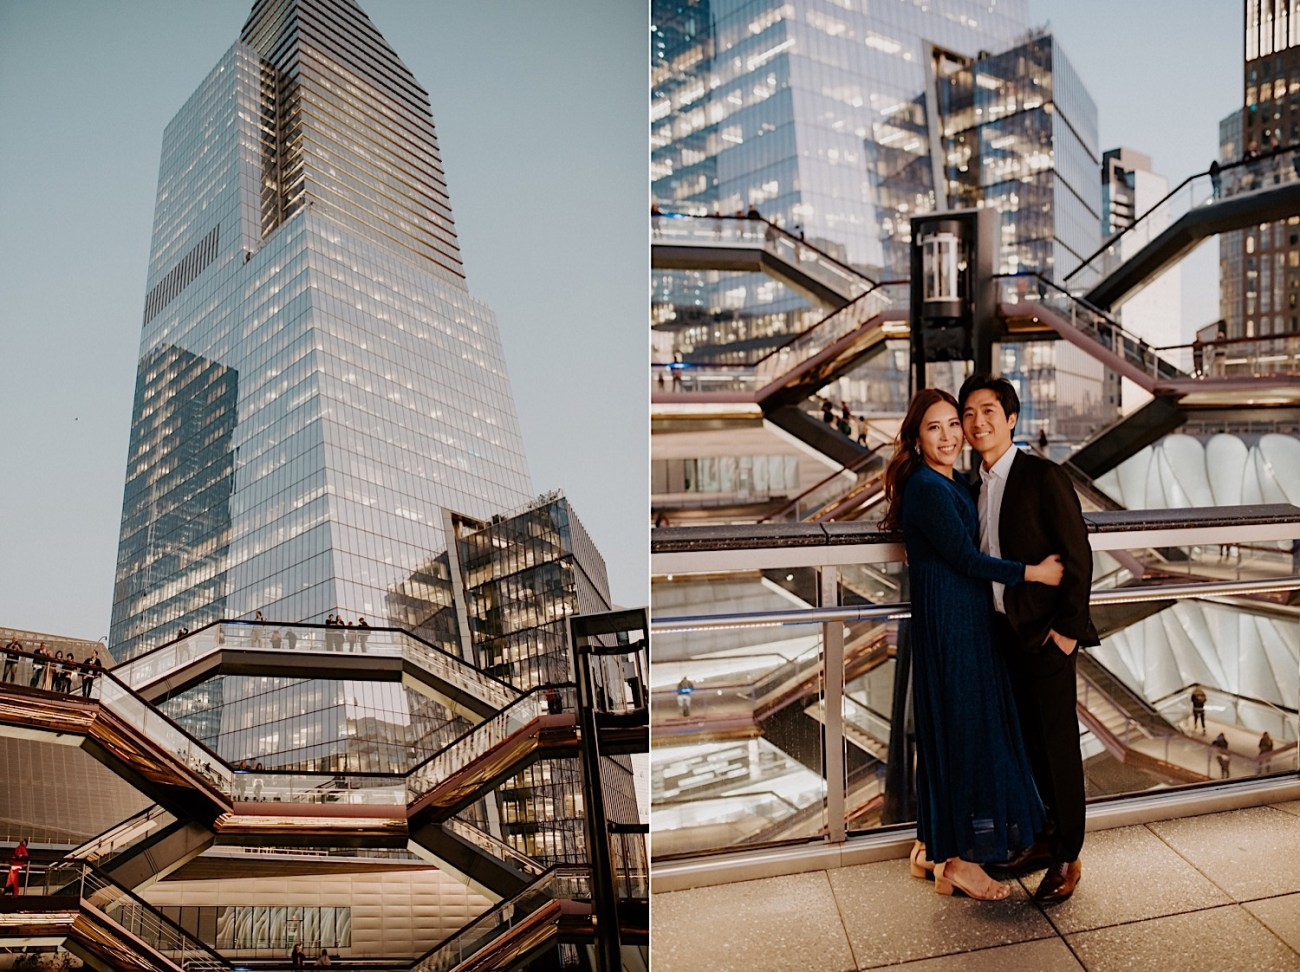 Highline NYC Engagement Session The Vessel Engagement Photos New York Wedding Photographer 30